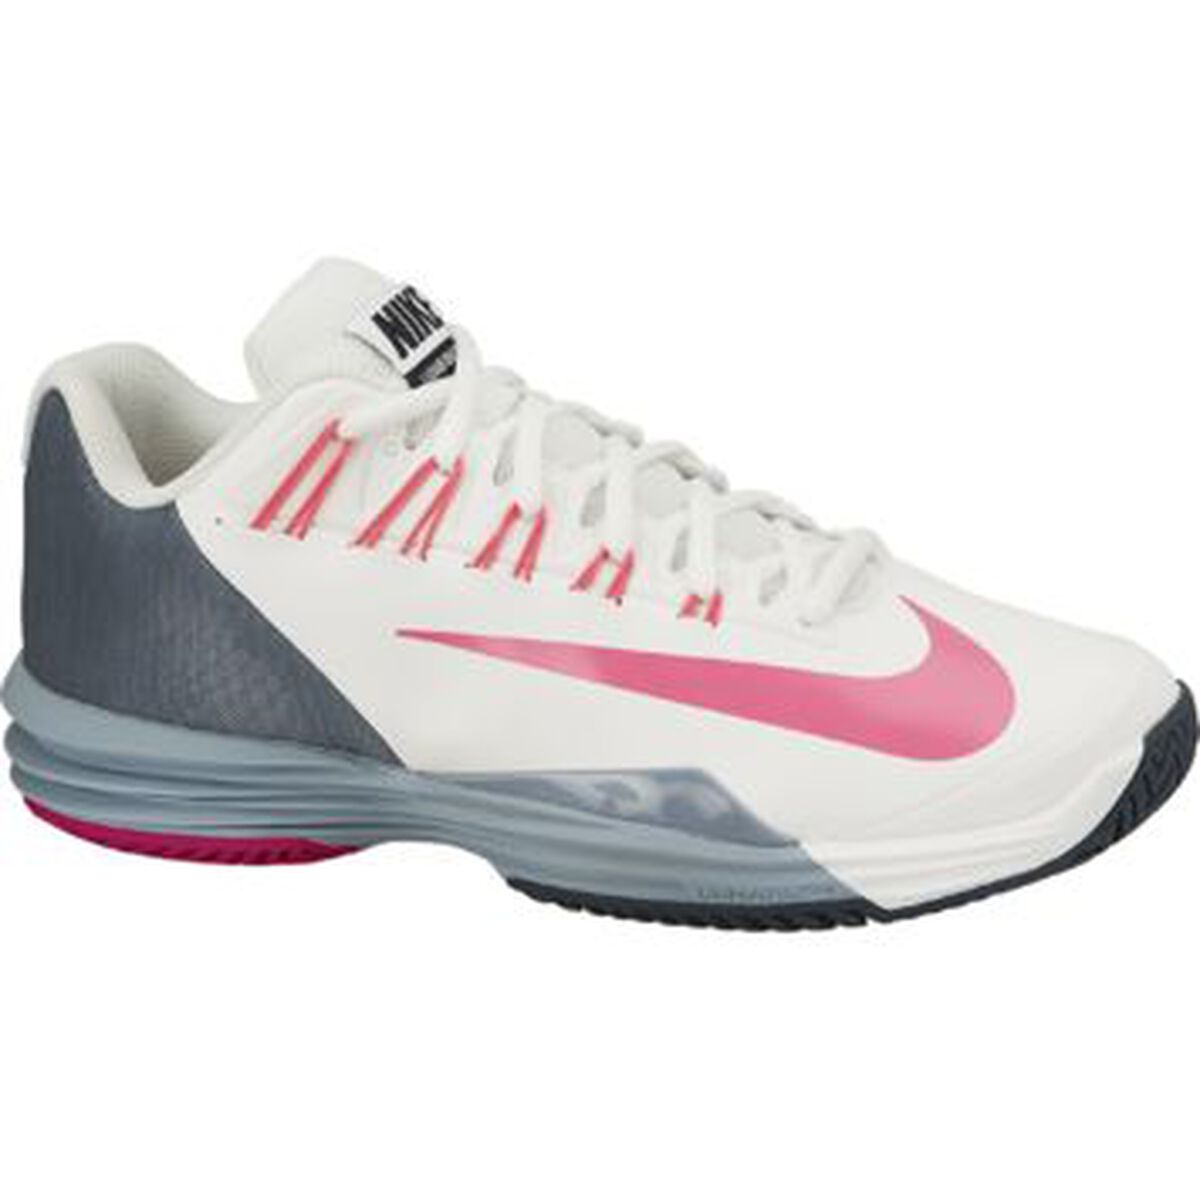 more photos b0ada 0dcb6 Nike Lunar Ballistic Women  39 s Tennis Shoe - Ivory Grey Pink Zoom Image